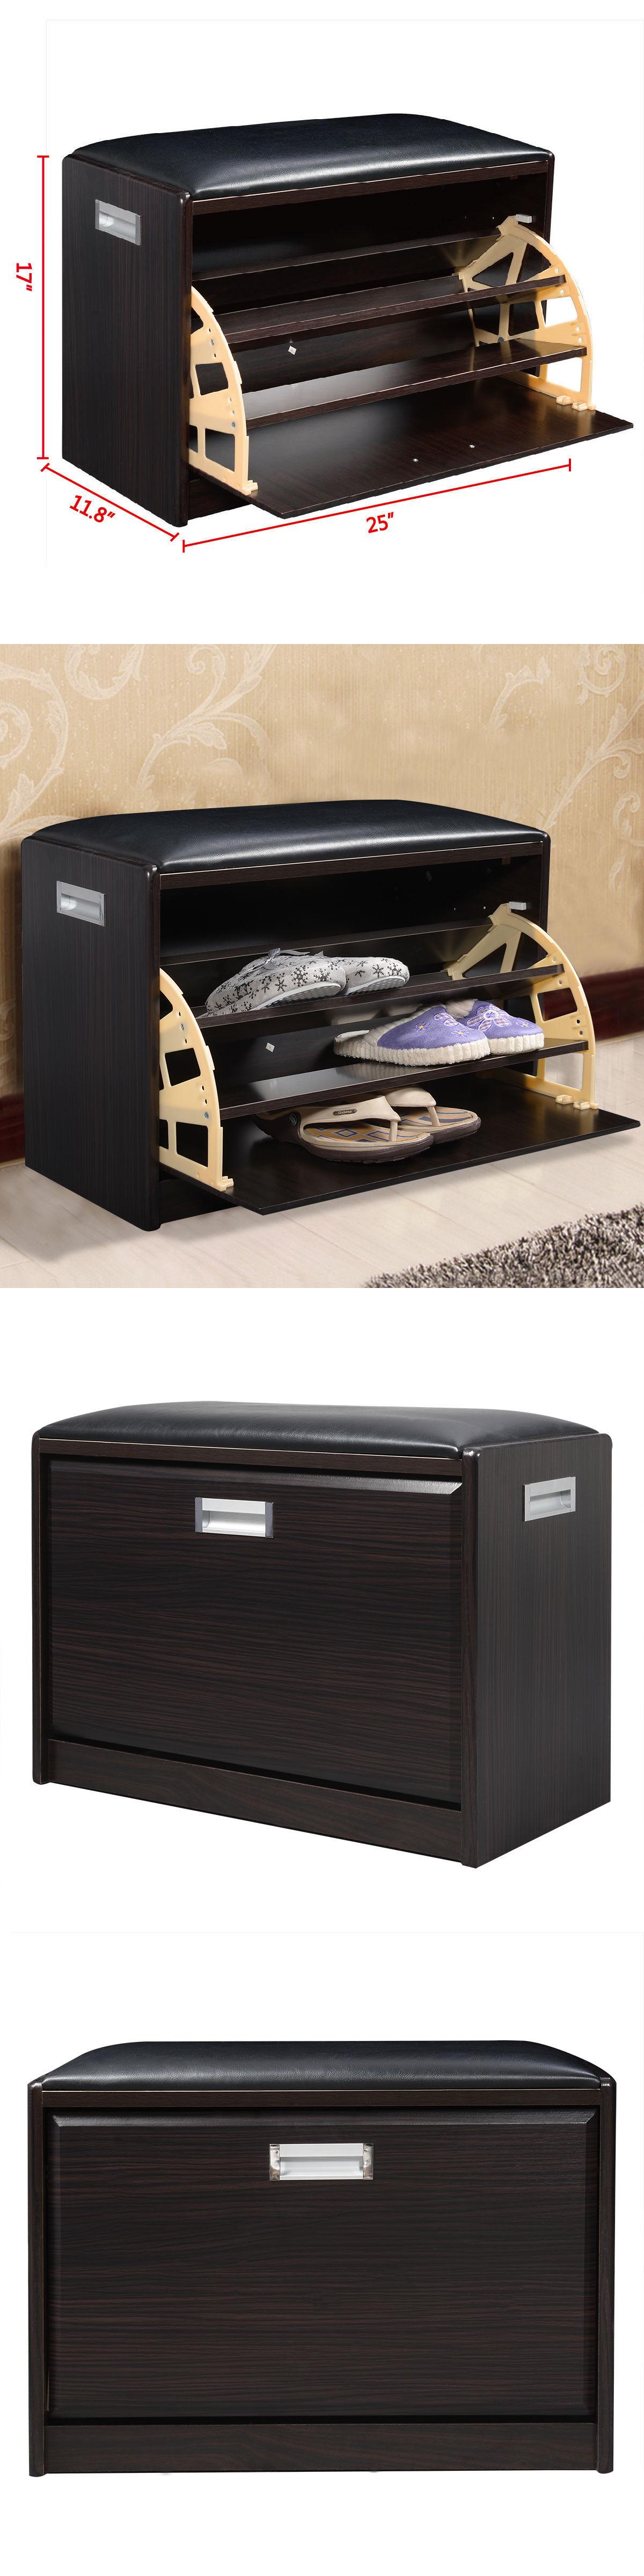 Shoe organizers wood shoe storage bench ottoman cabinet